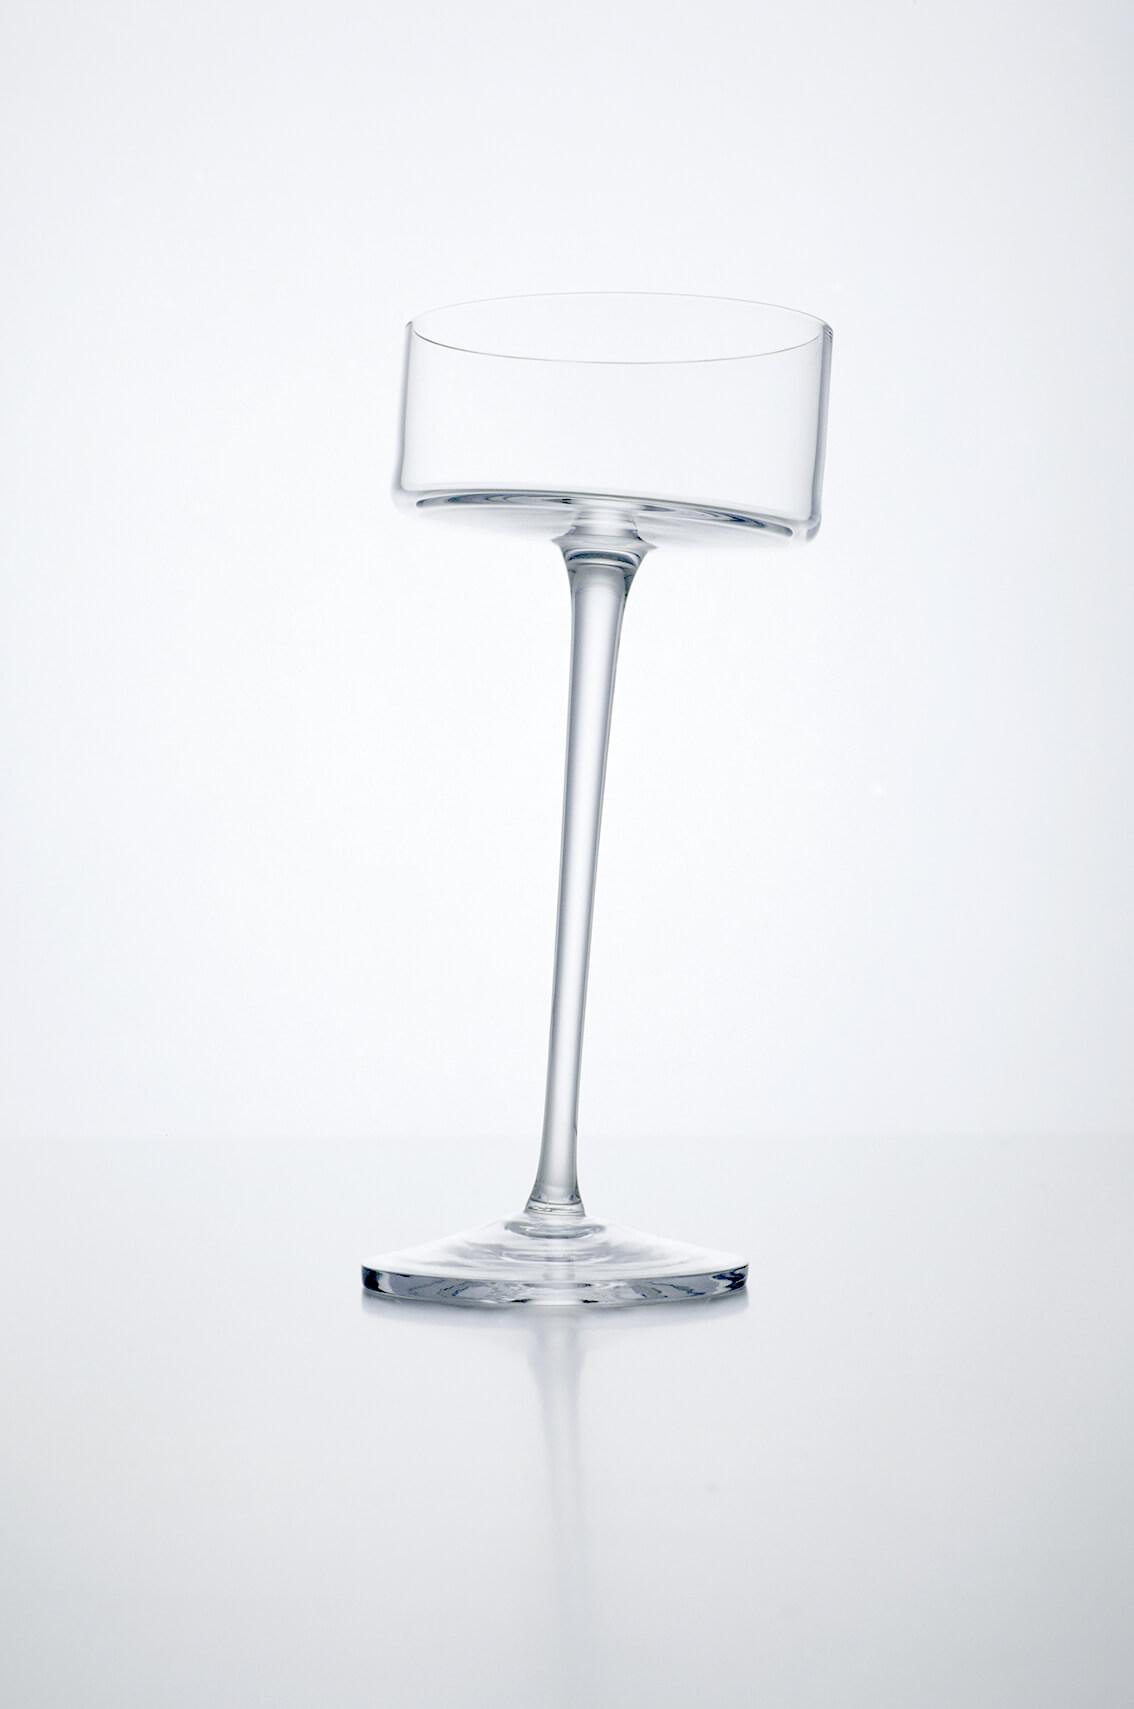 lucyd_SCOTT_glass_2_hochkant Kopie